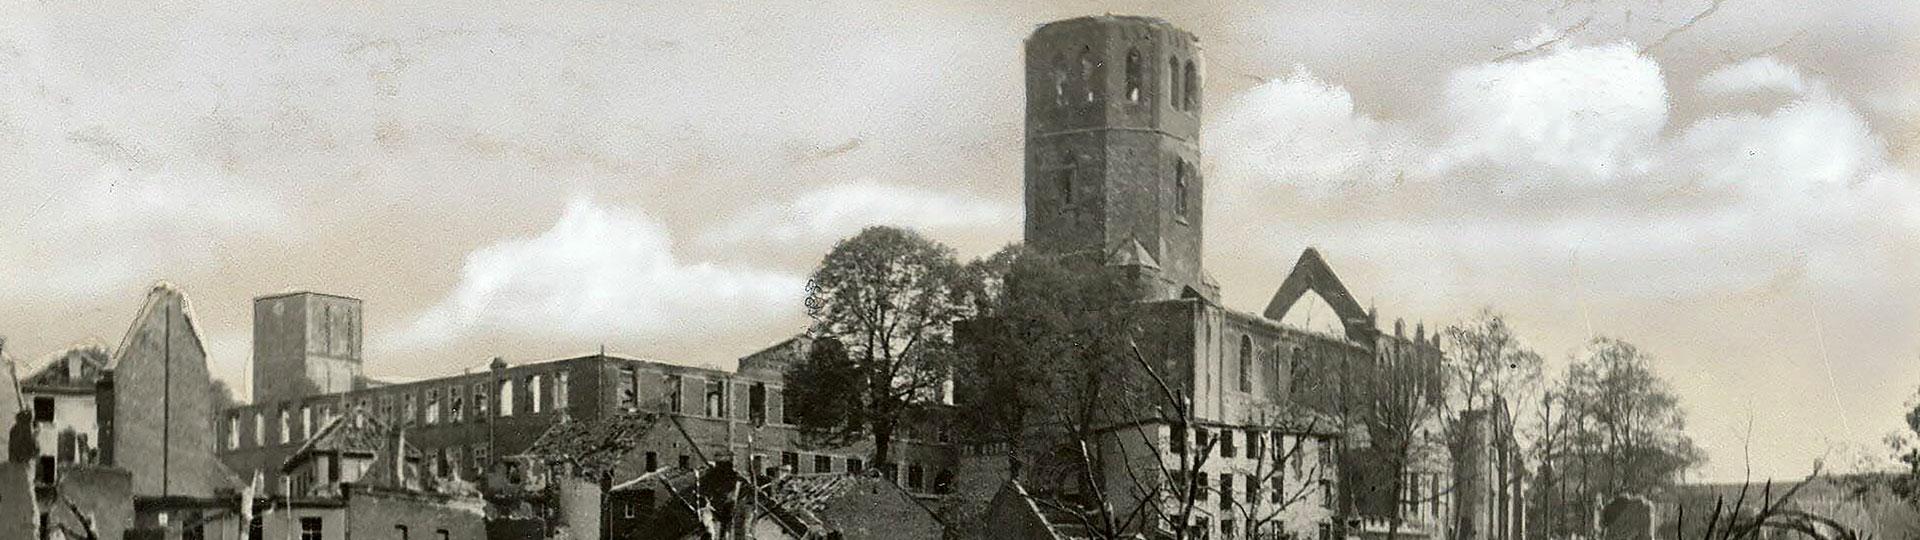 Foto Münster St. Vitus nach Bombenangriff